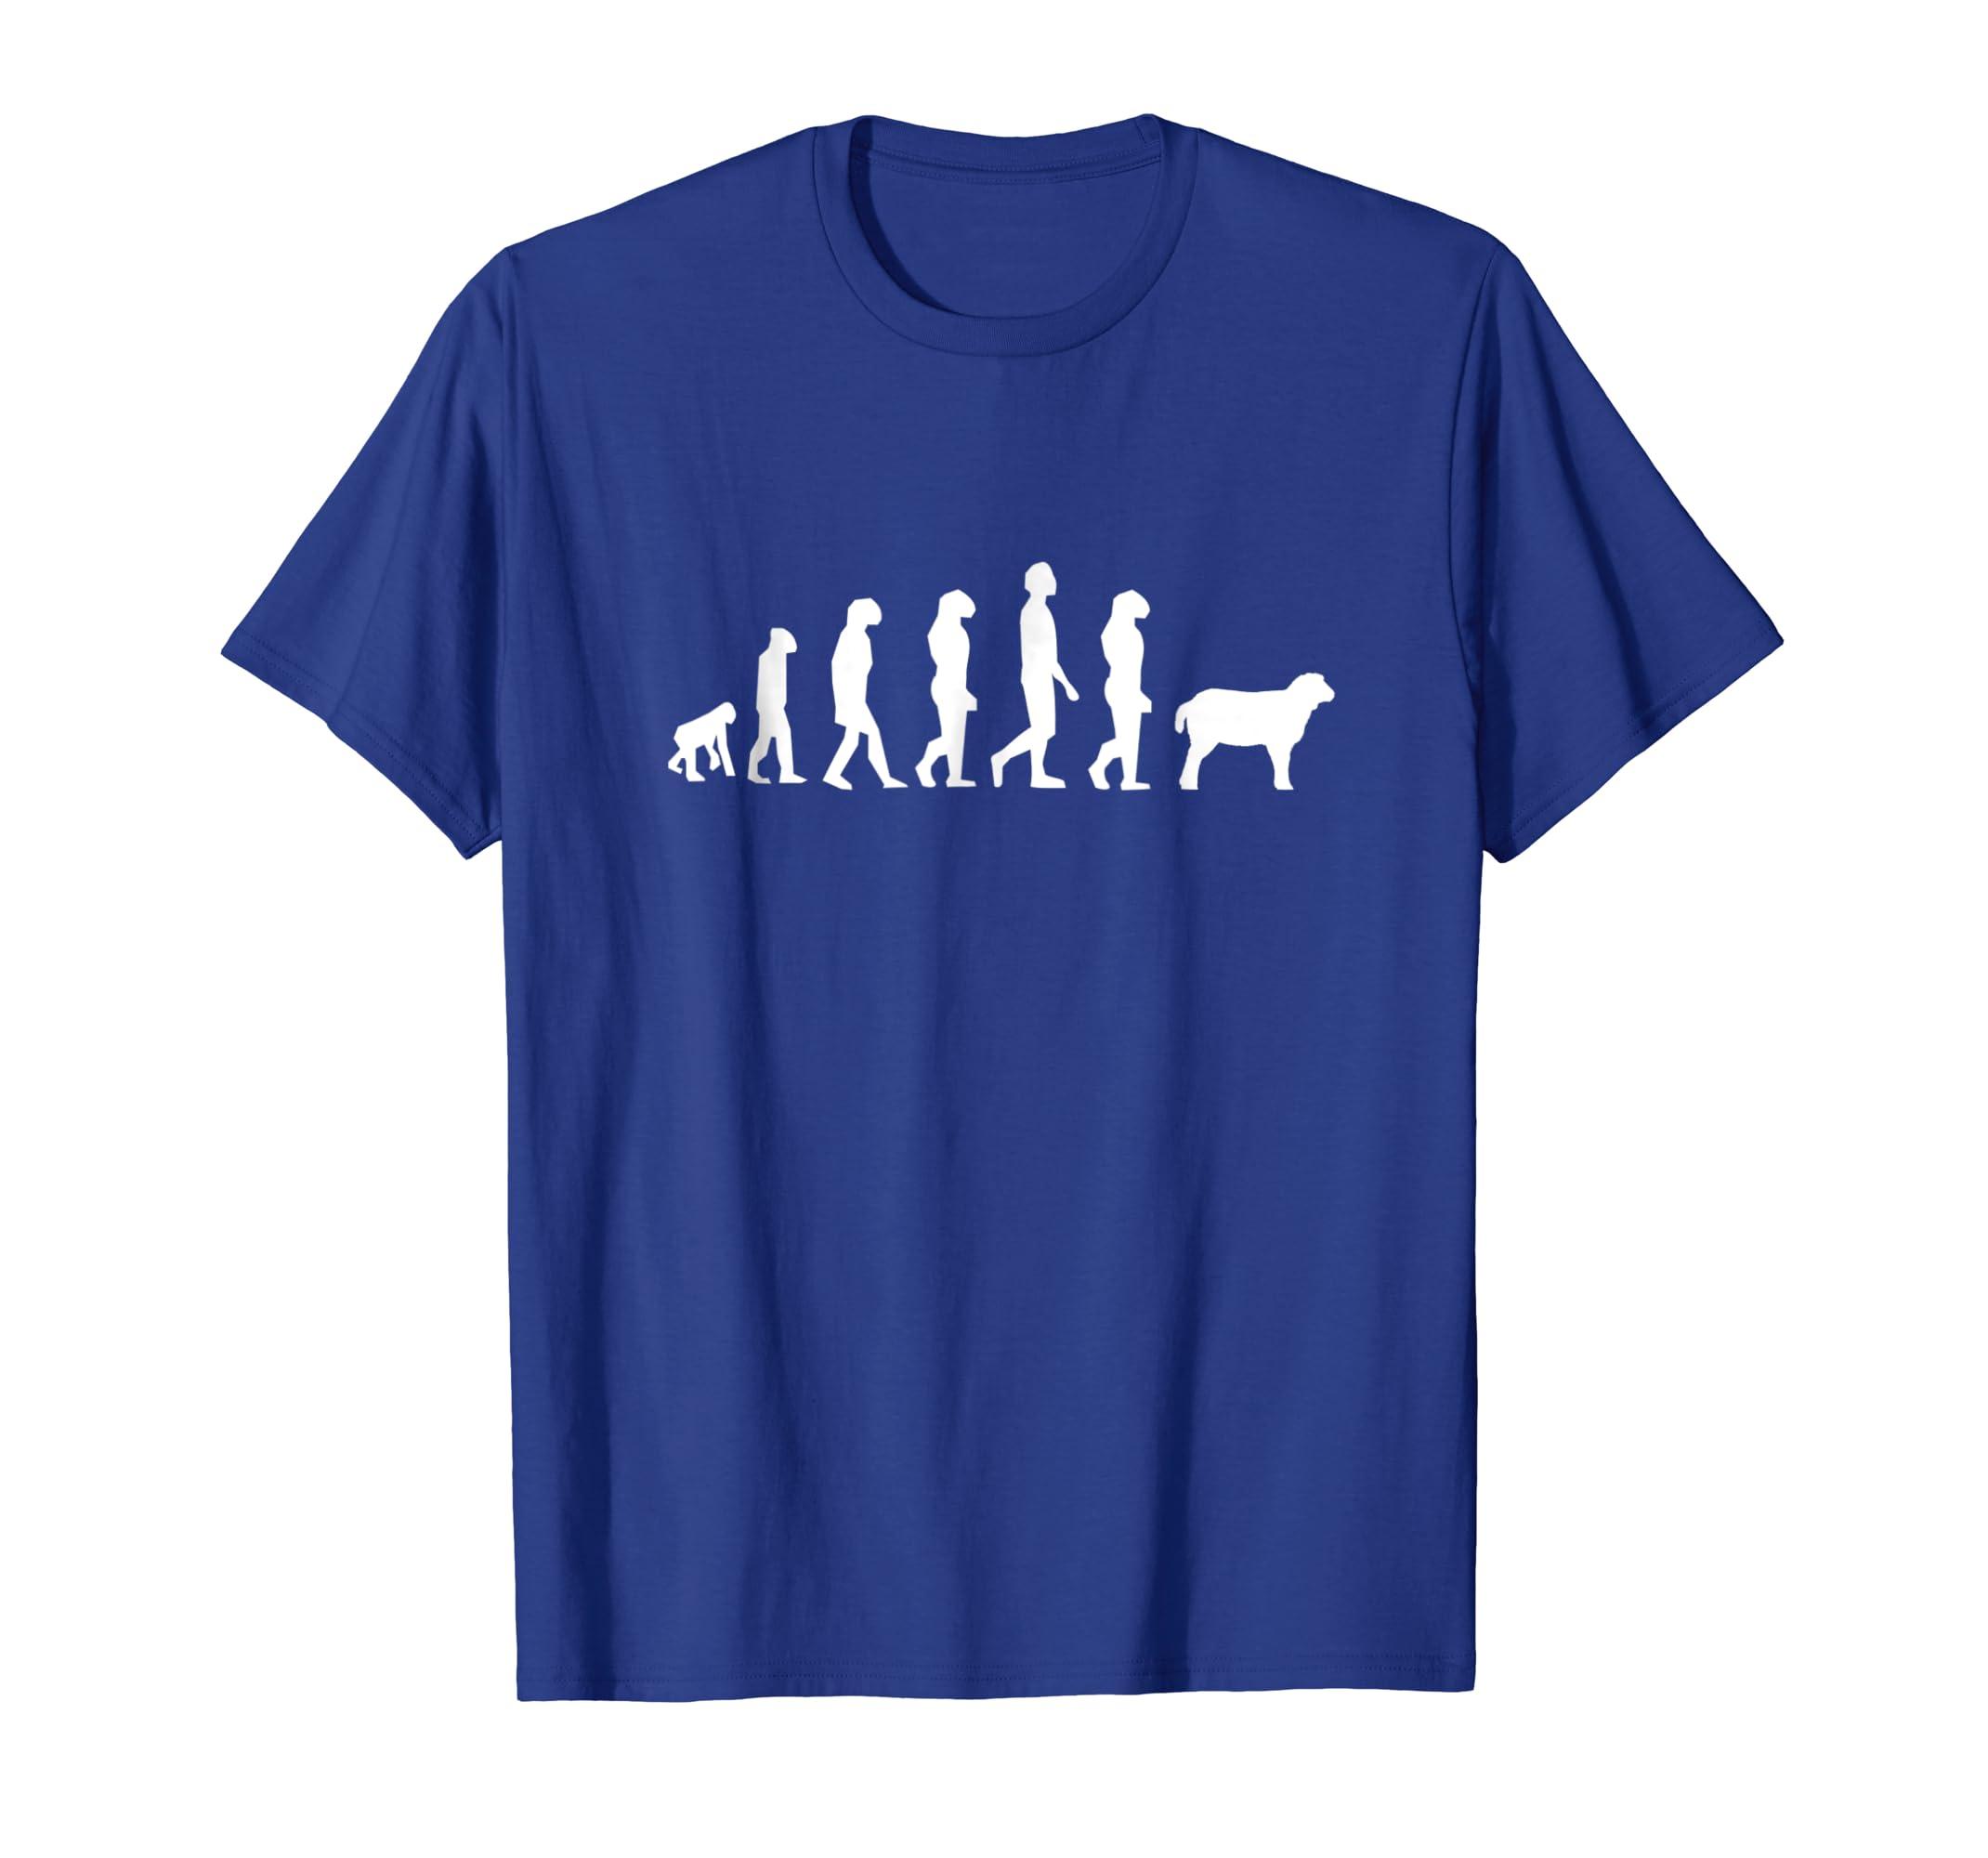 9fe43ed1f Amazon.com: Evolution Of Man Monkey Sheep Funny Political Gift T Shirt:  Clothing